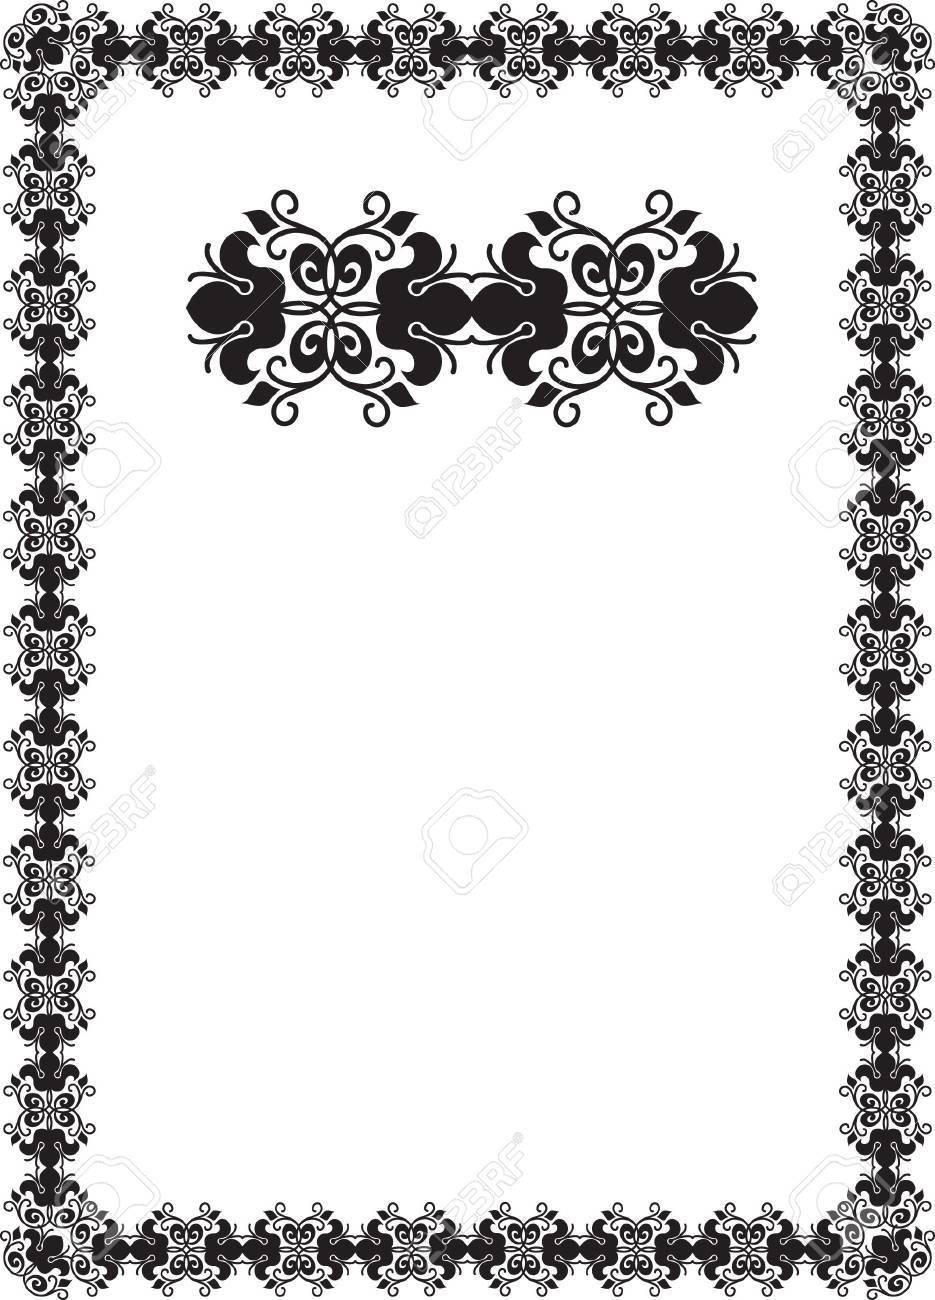 black floral frame border pattern Stock Photo - 7780341